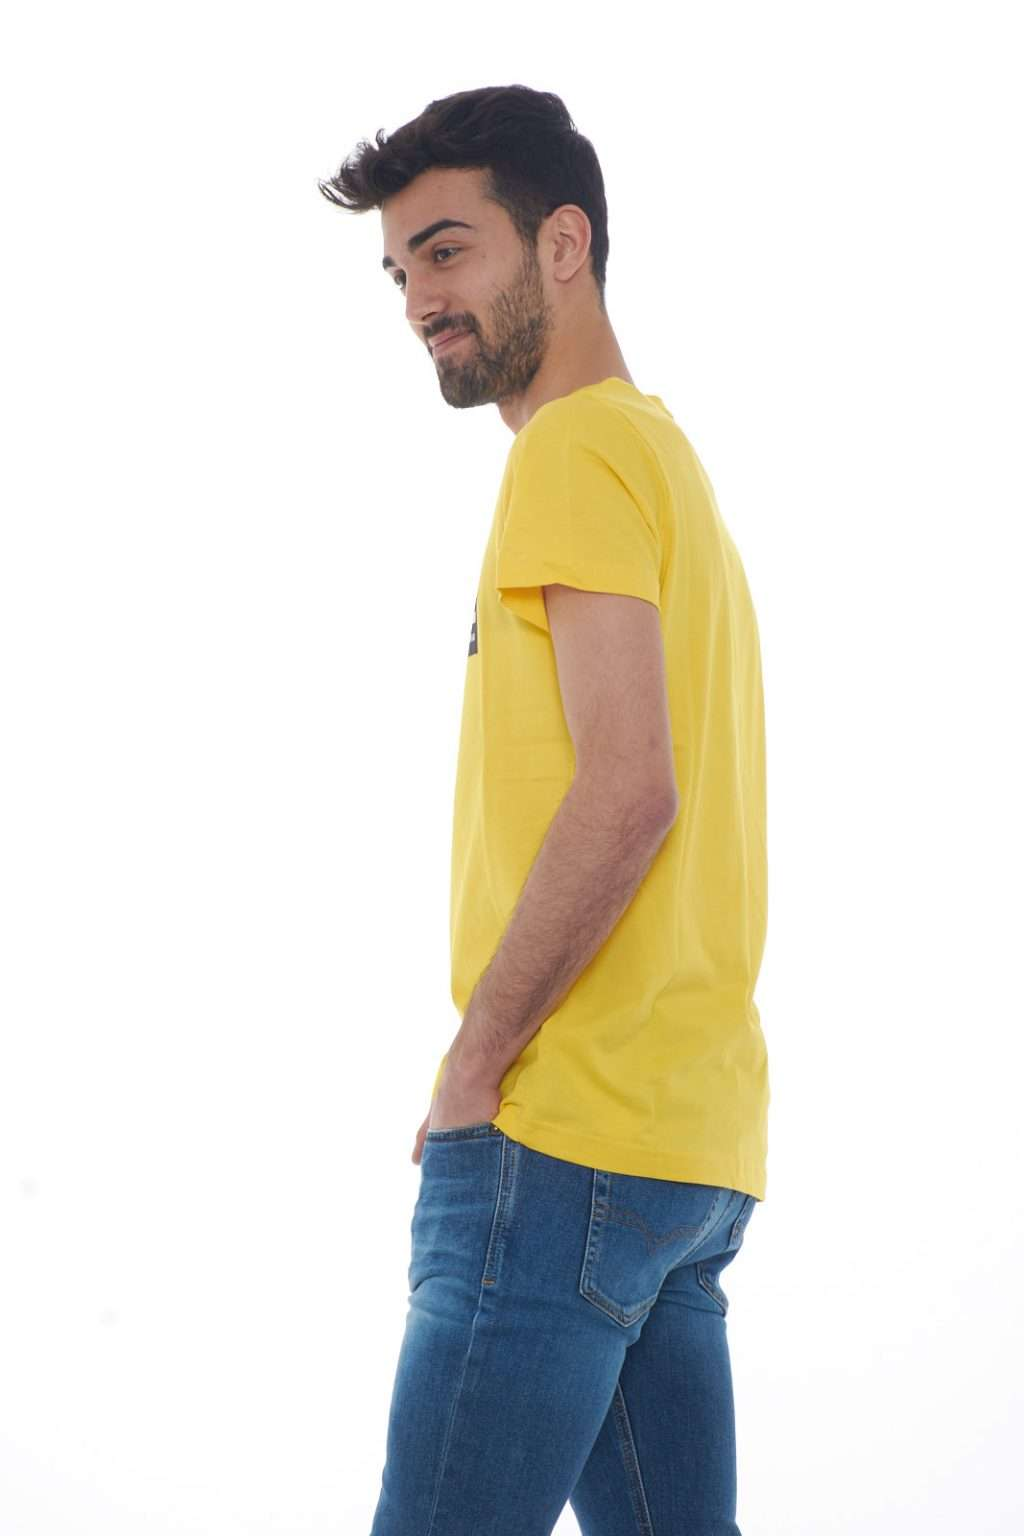 https://www.parmax.com/media/catalog/product/a/i/PE-outlet_parmax-t-shirt-uomo-Diesel-00SDP1%200091A-B.jpg